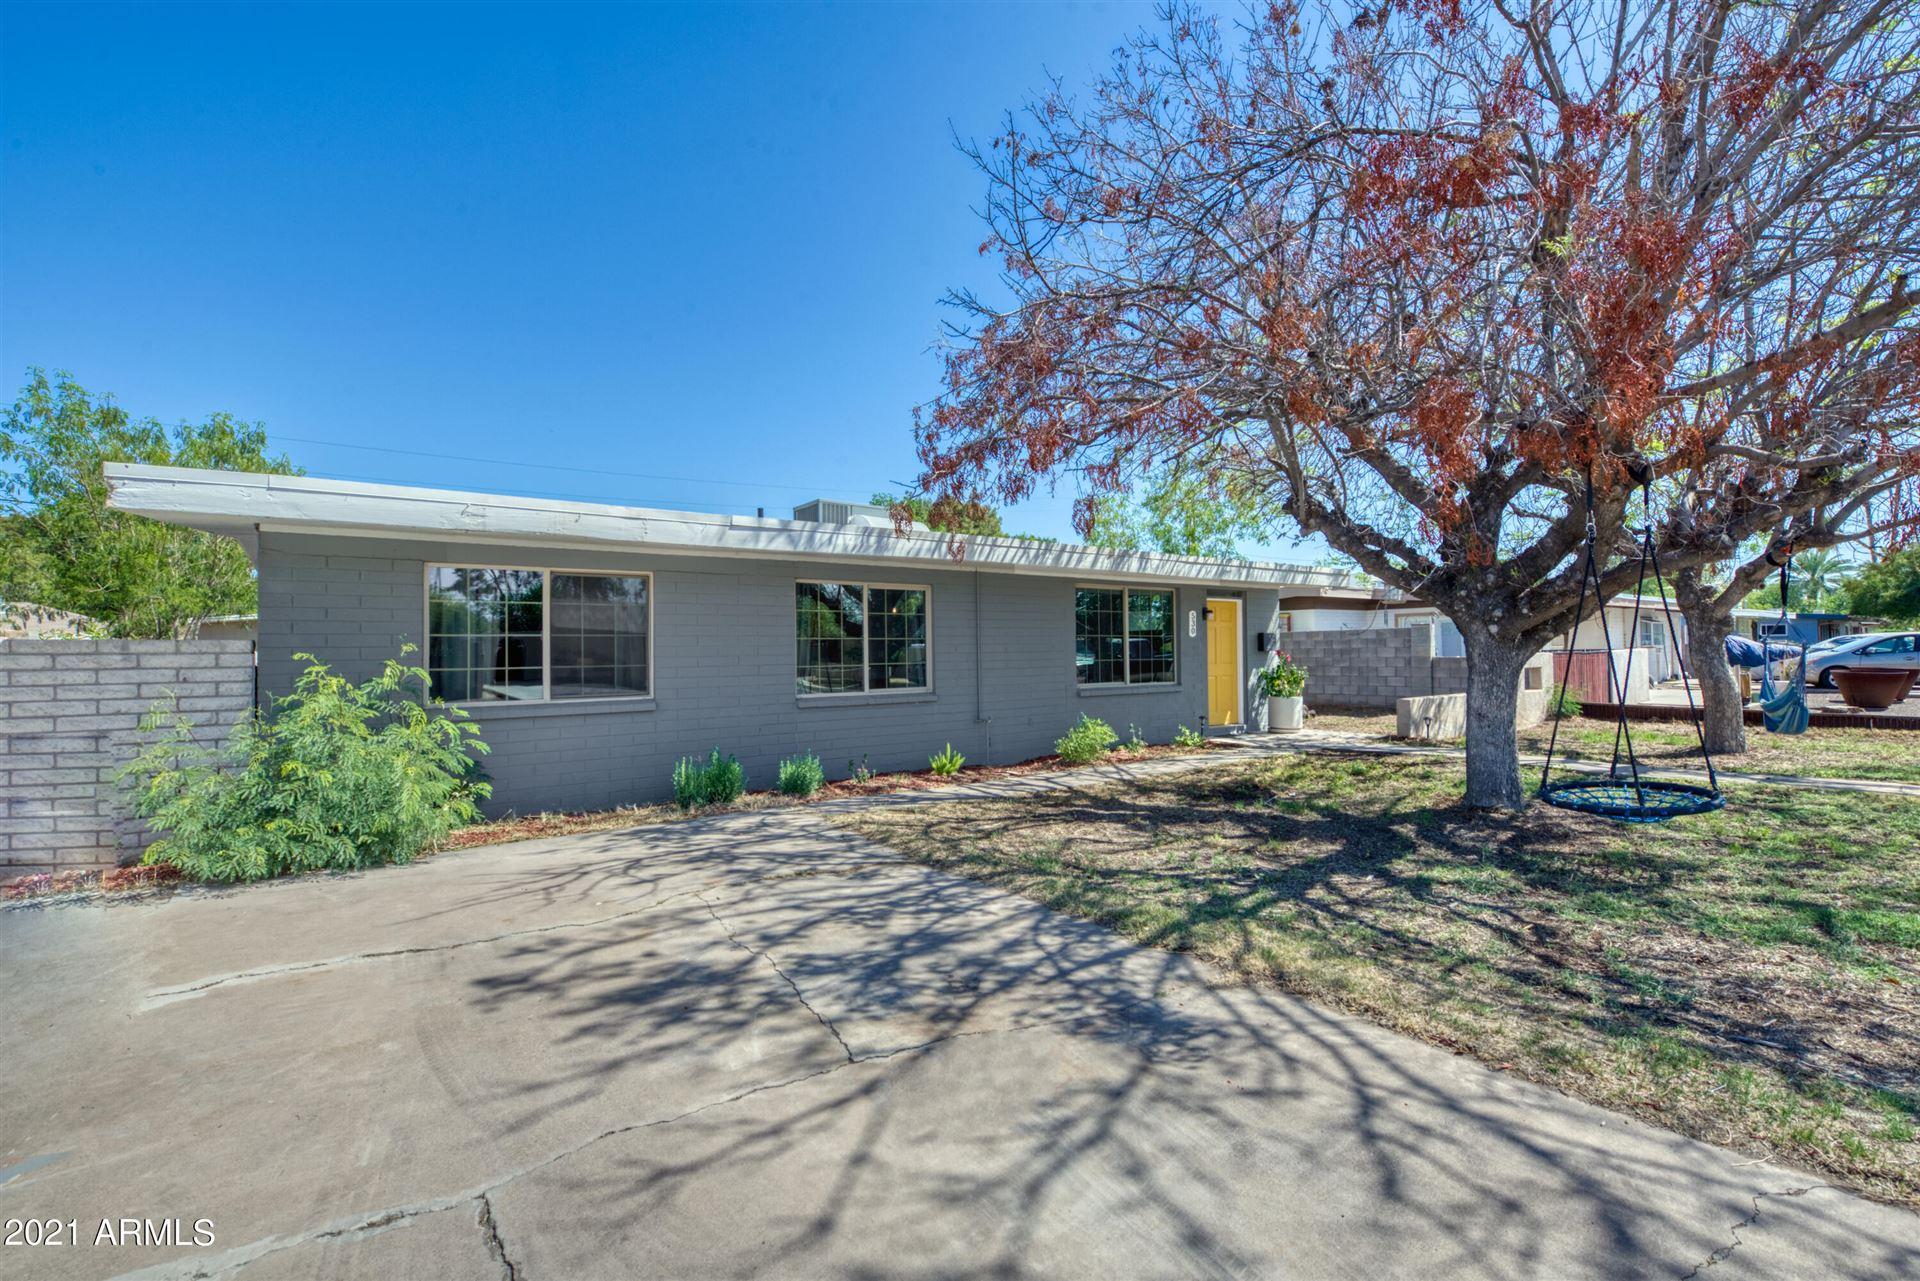 530 W 17TH Street, Tempe, AZ 85281 - MLS#: 6221571